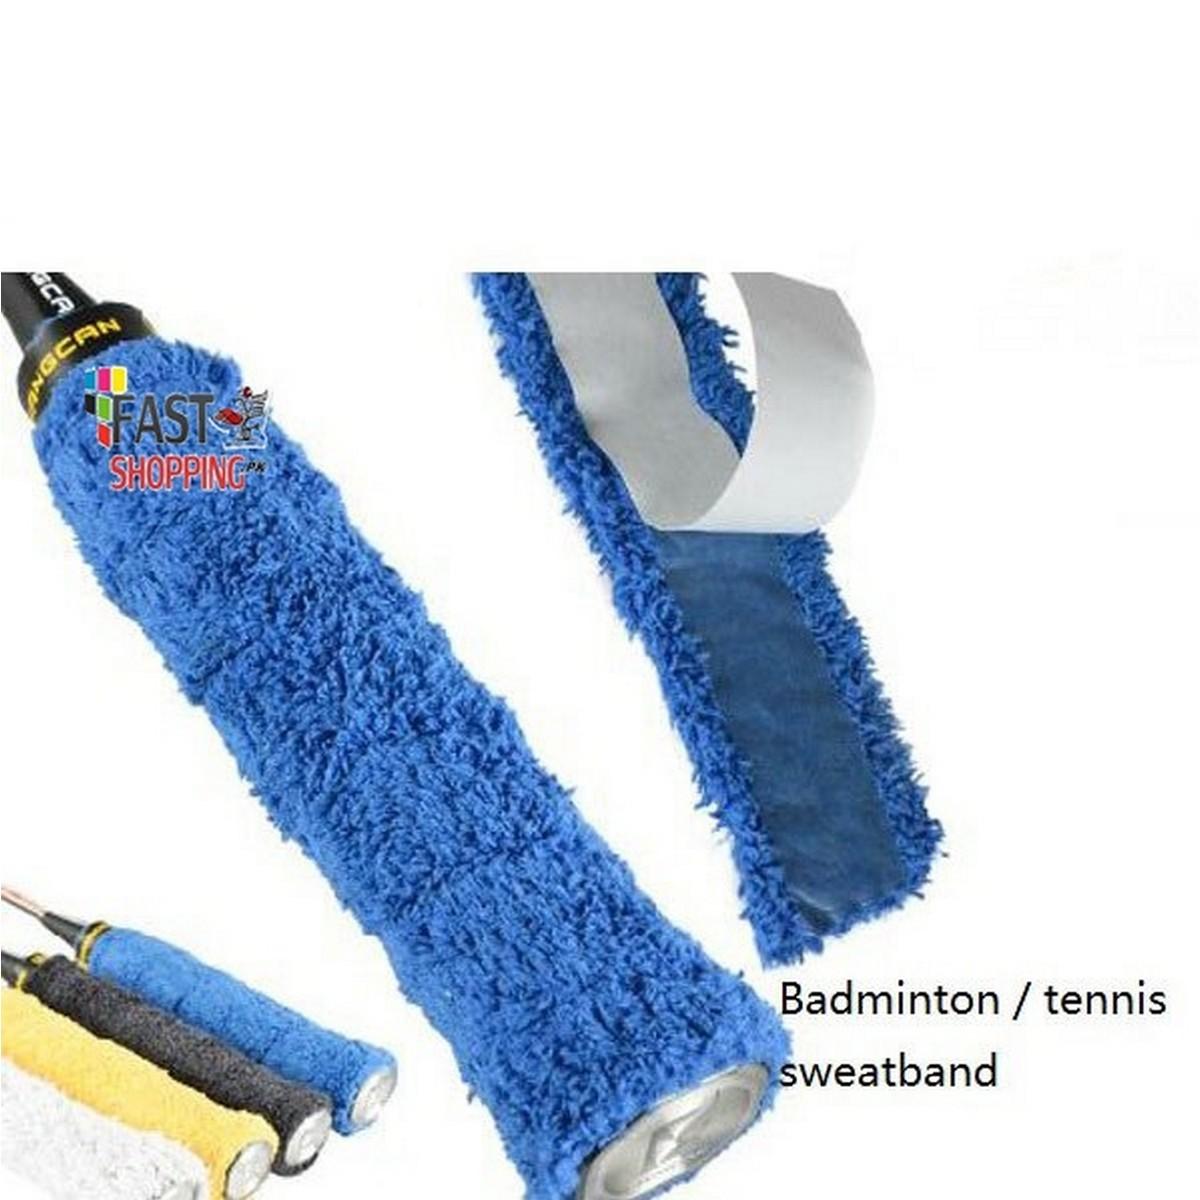 Pack of 2 Badminton Racket Towel Badminton Grips